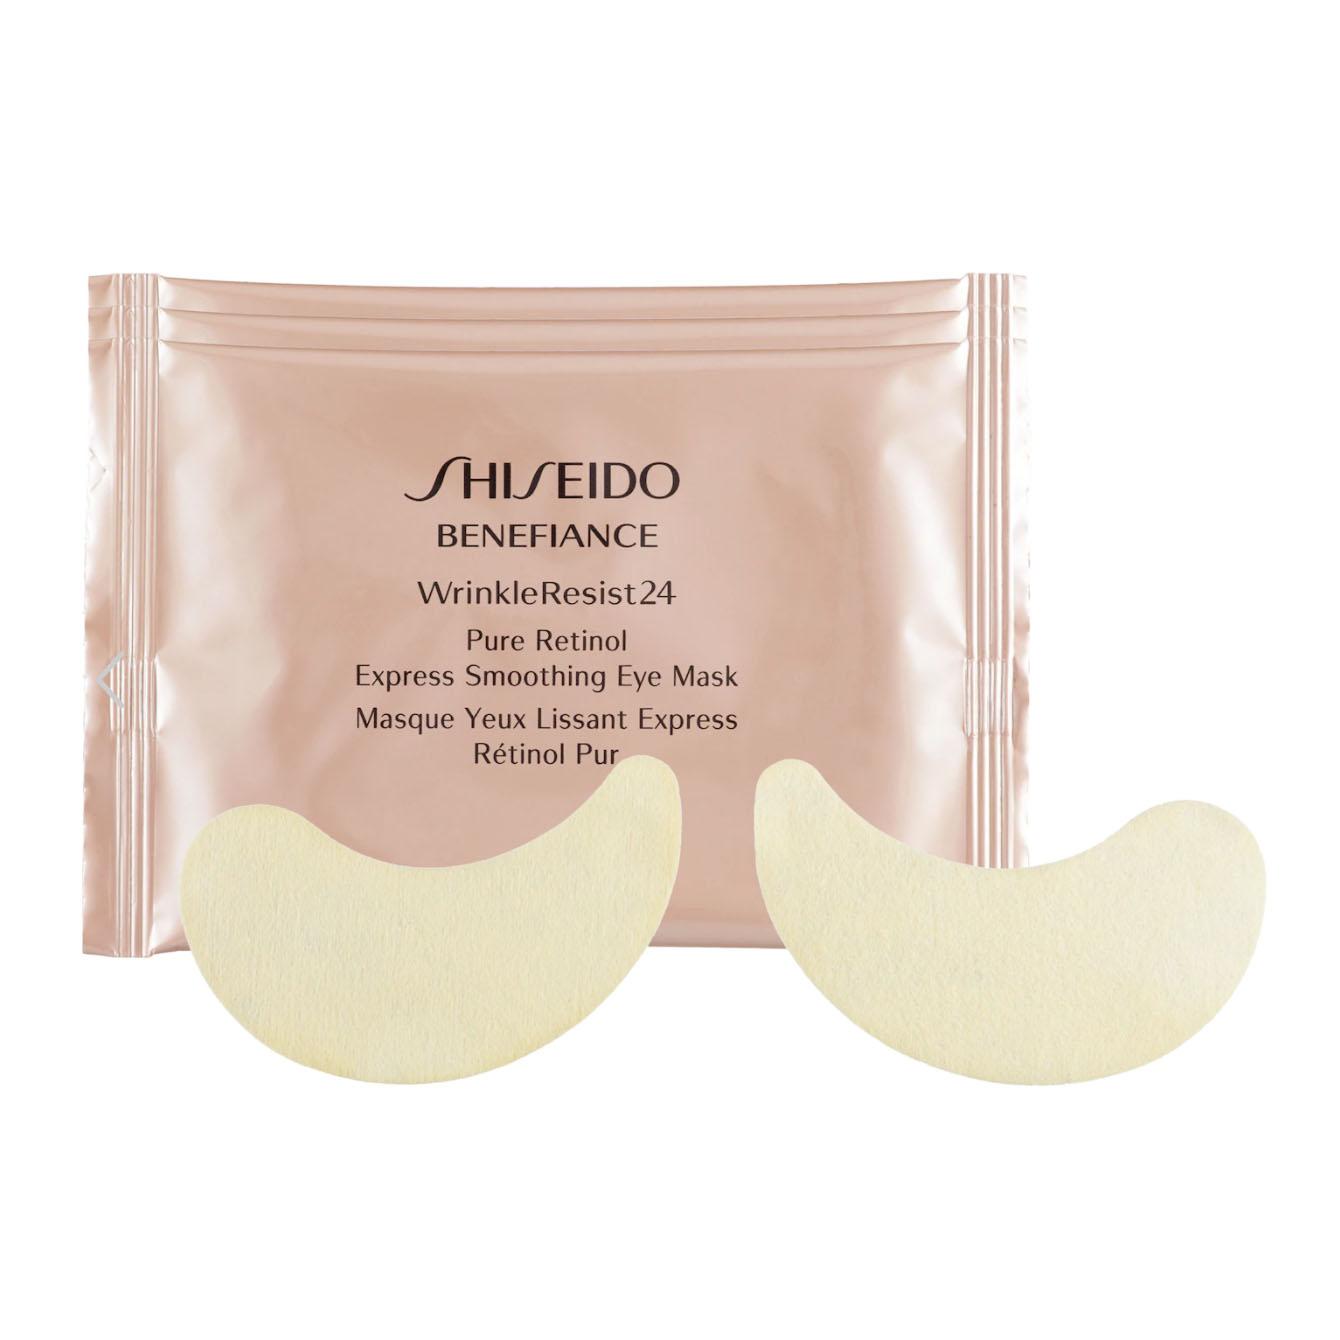 best under eye patches anti aging wrinkles fine lines retinol shiseido